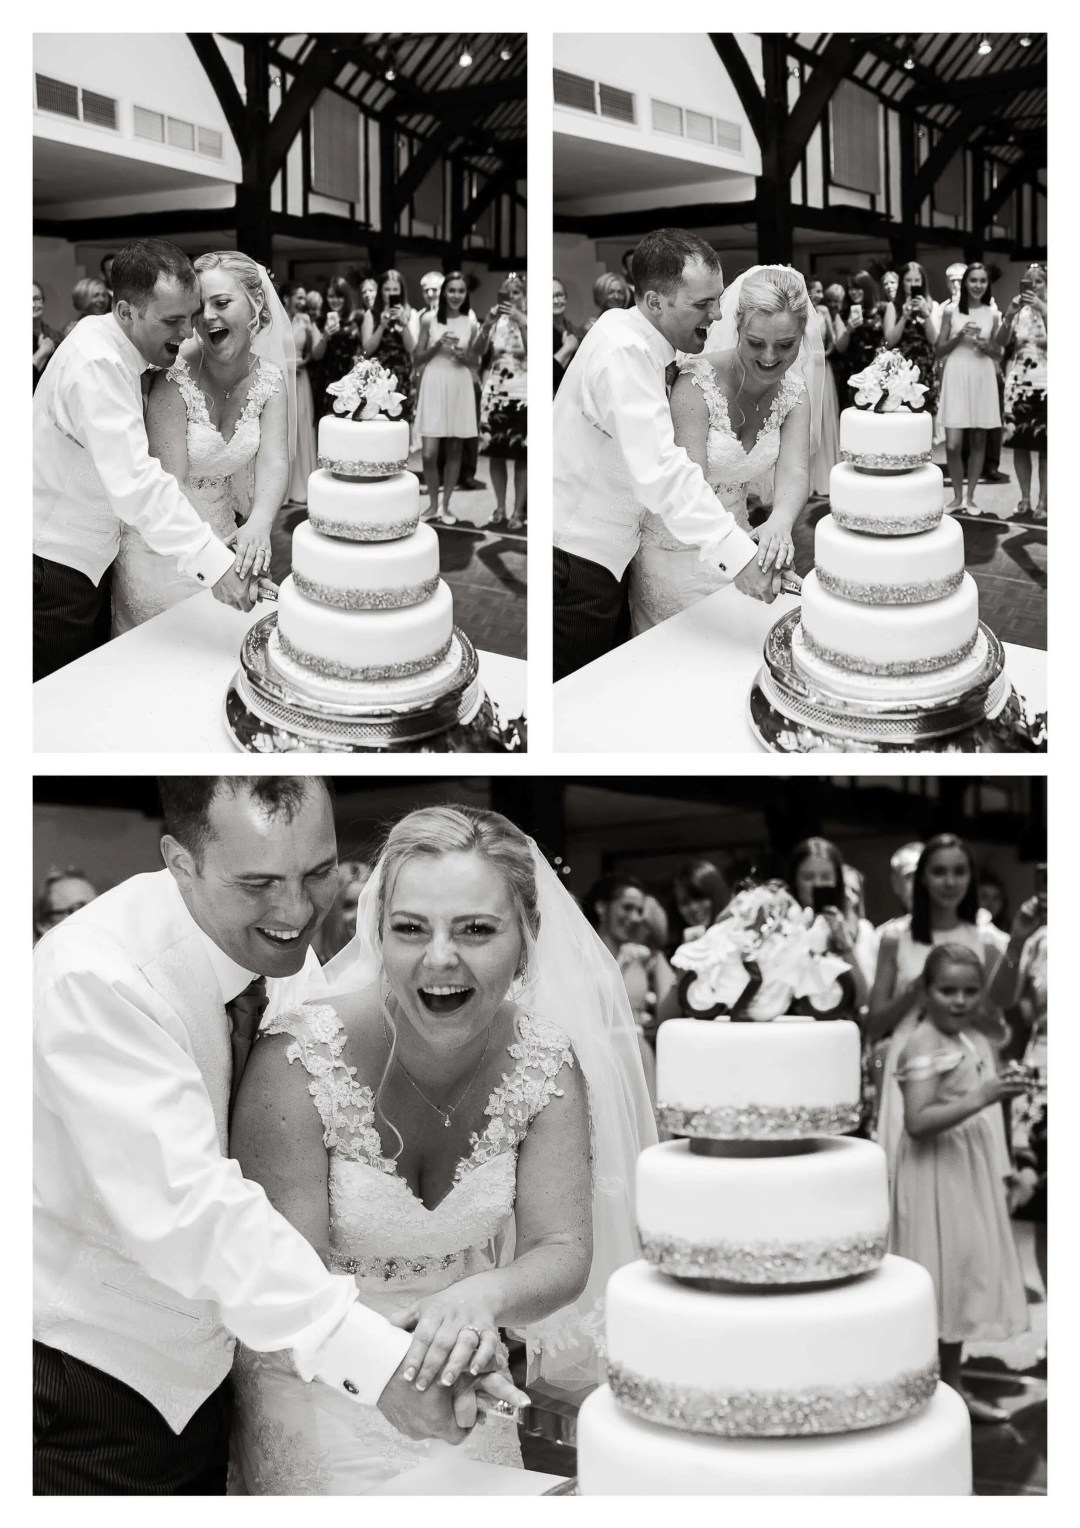 Tithe Barn at Mercure Box Hill Burford Bridge Hotel wedding cake cutting